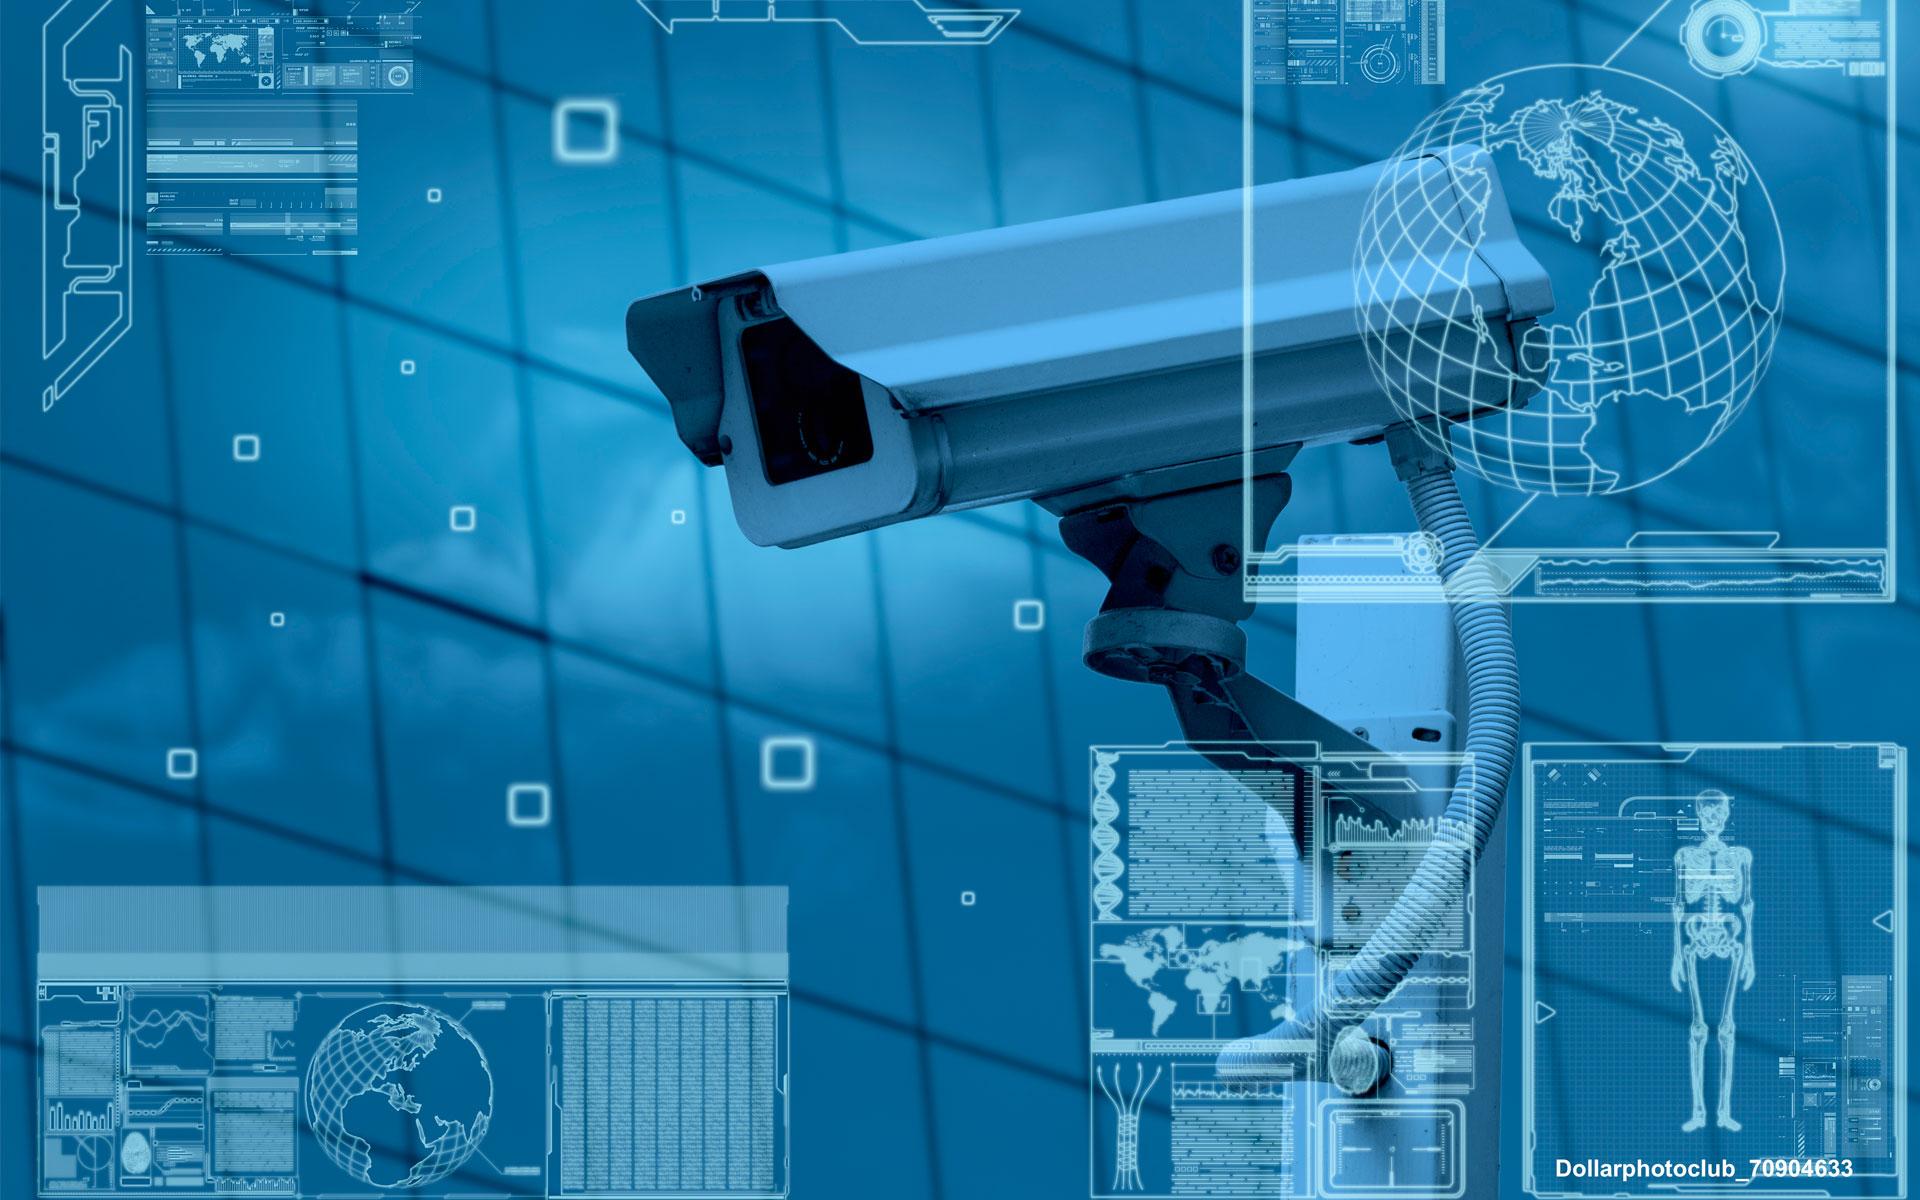 Alarm Camera System Wireless Security